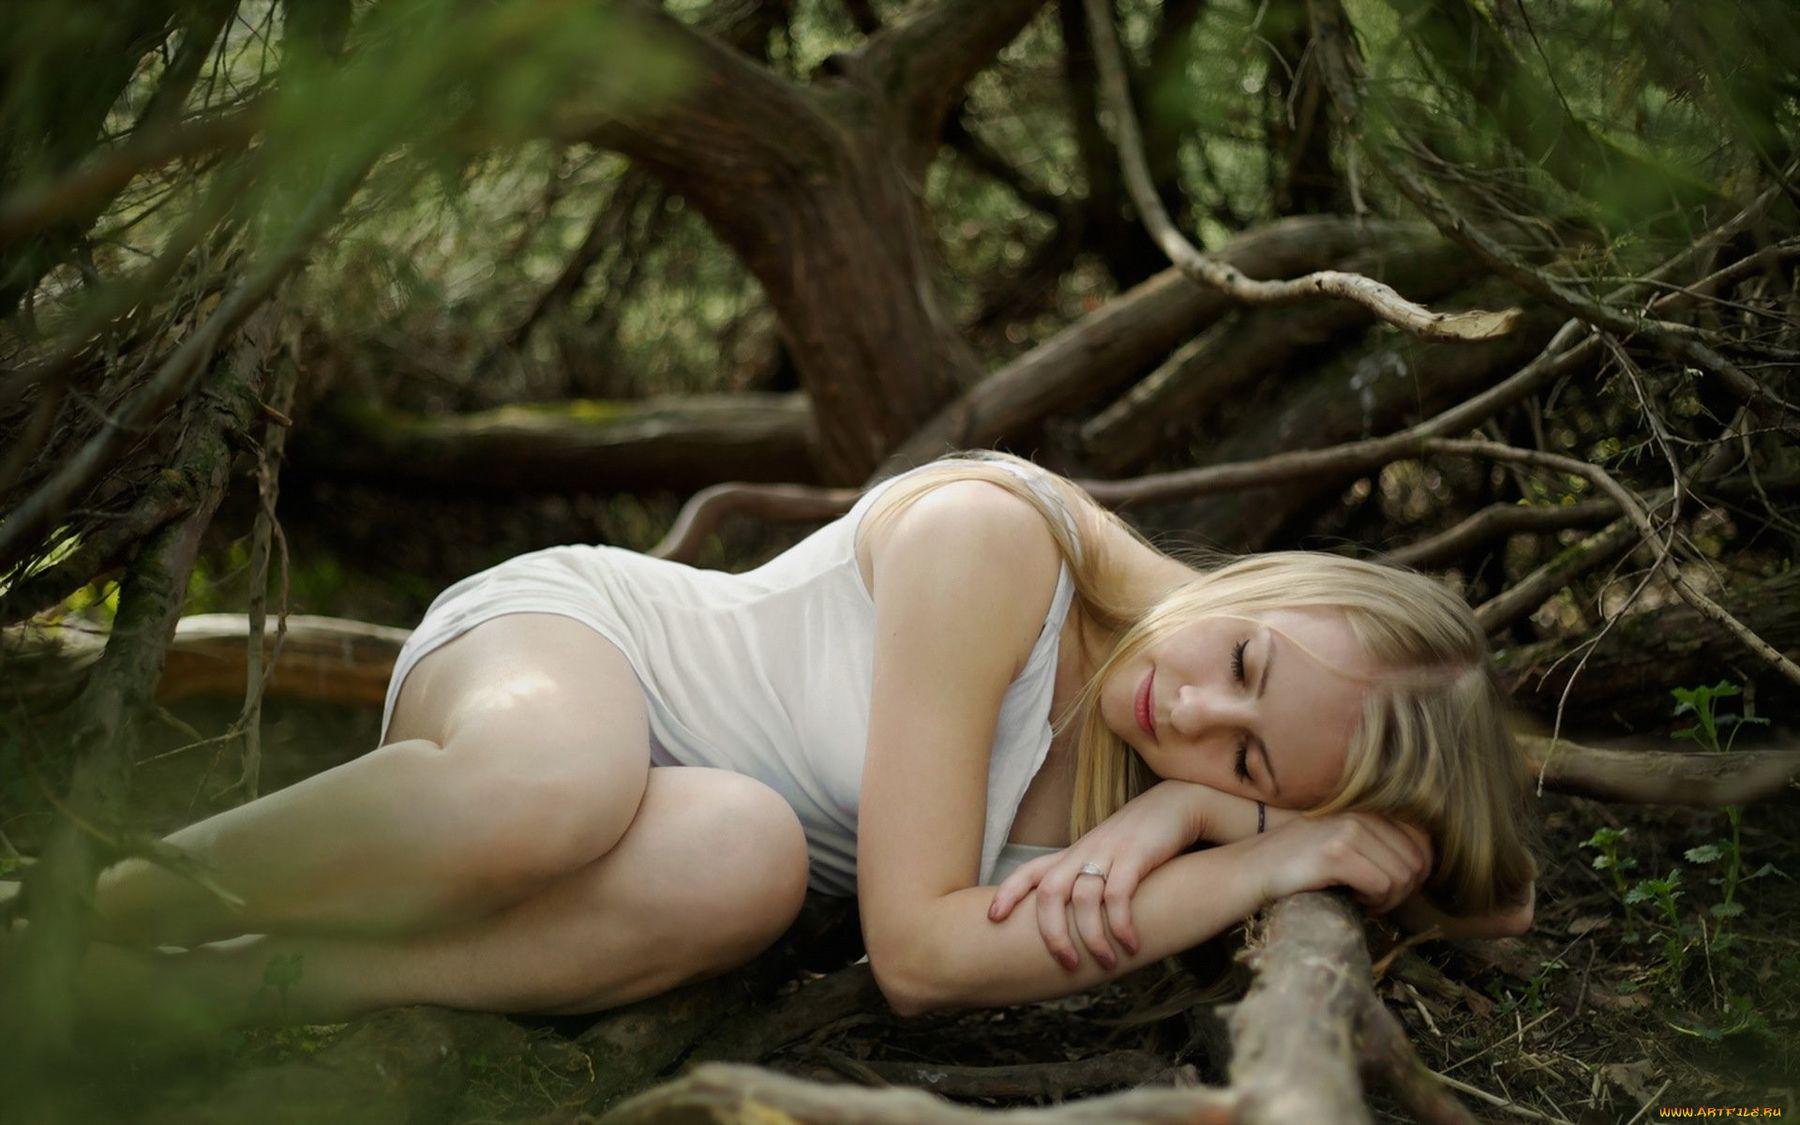 Спящая красавица девушка спящая красотка